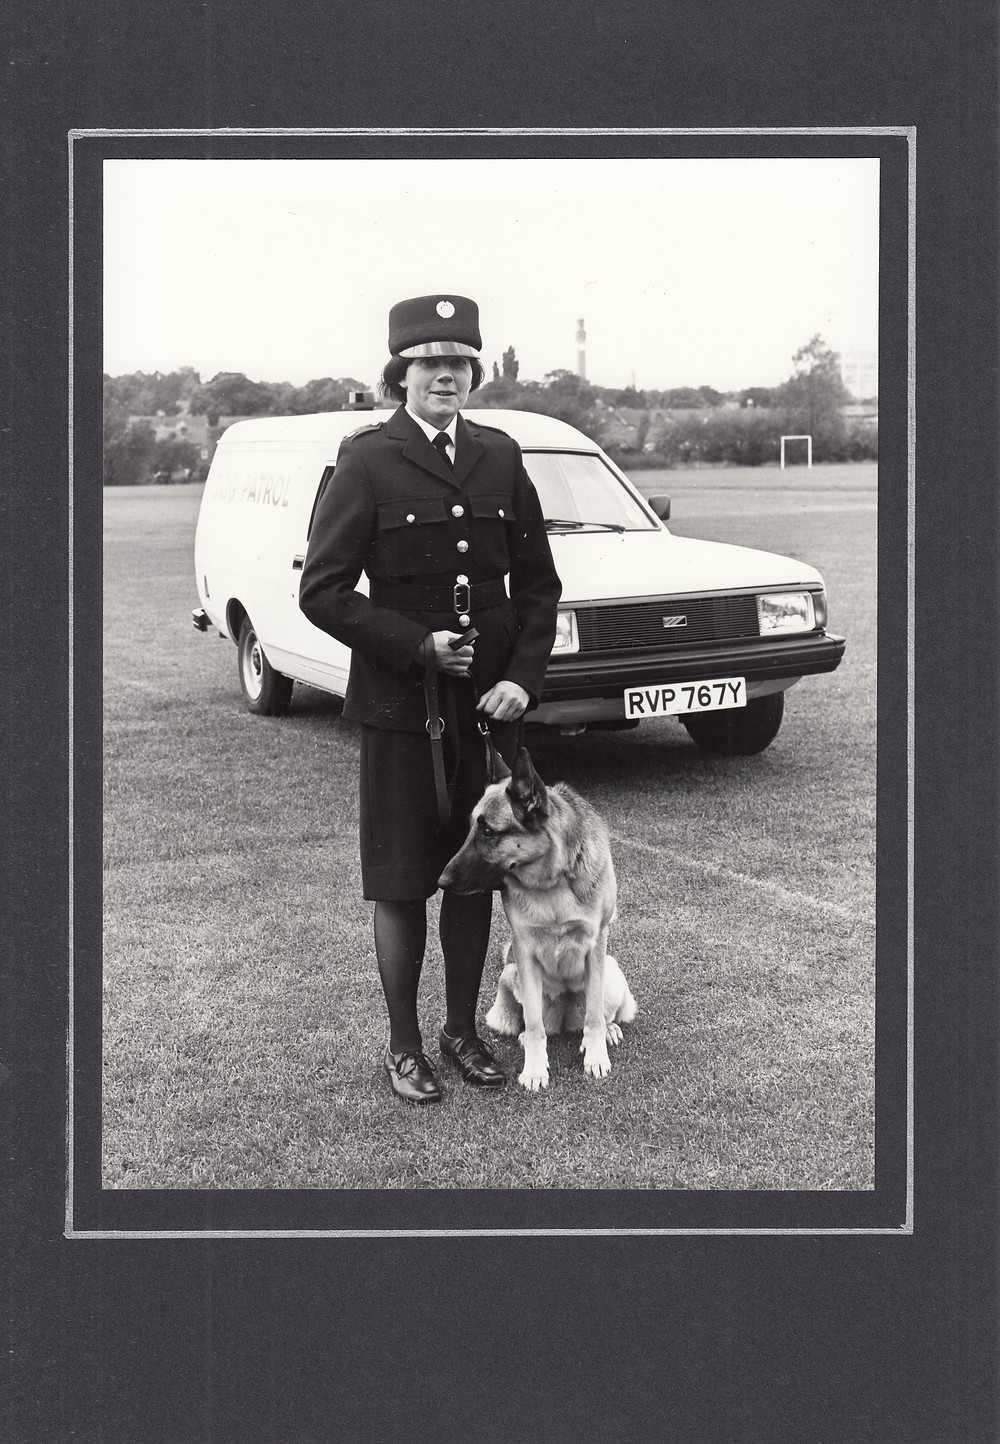 Jean in uniform with a German Shepherd police dog